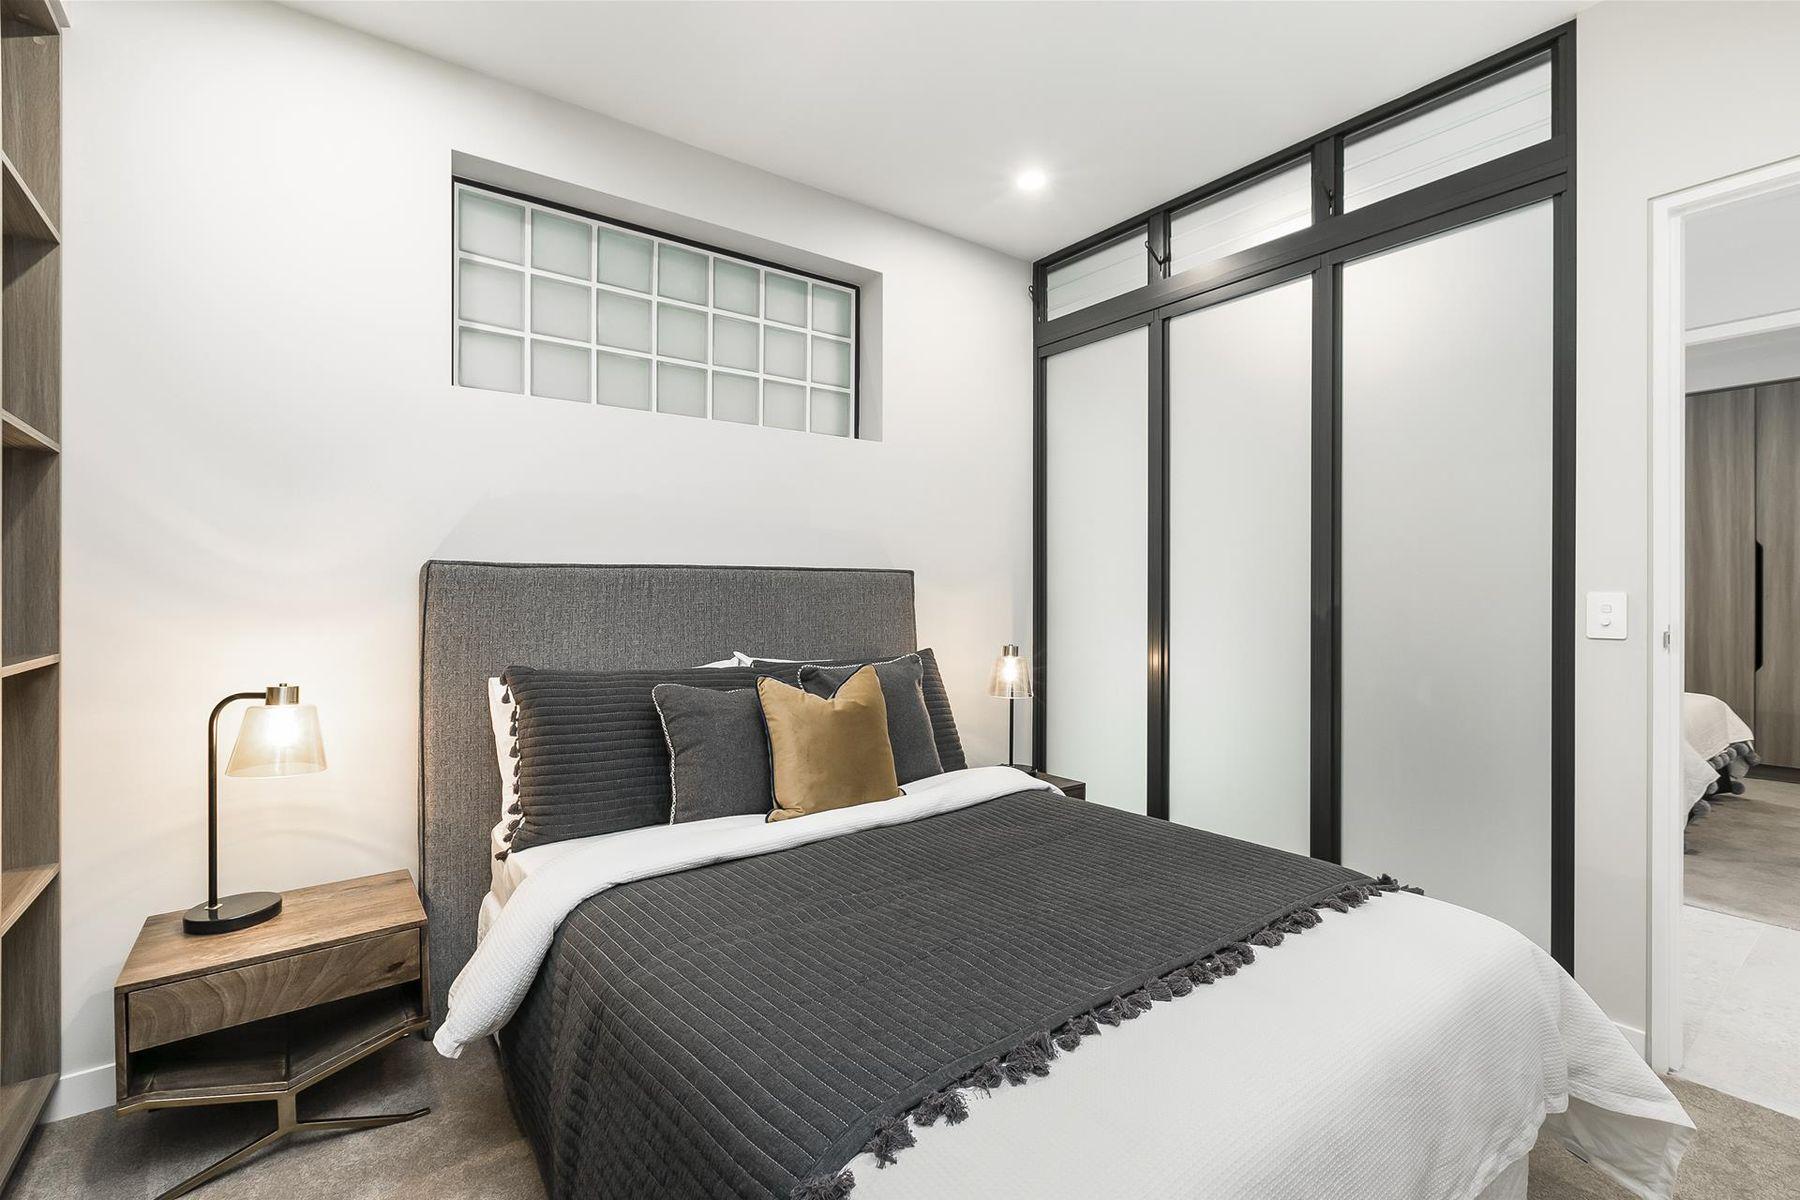 205/8 Colton Street, Highgate Hill, QLD 4101